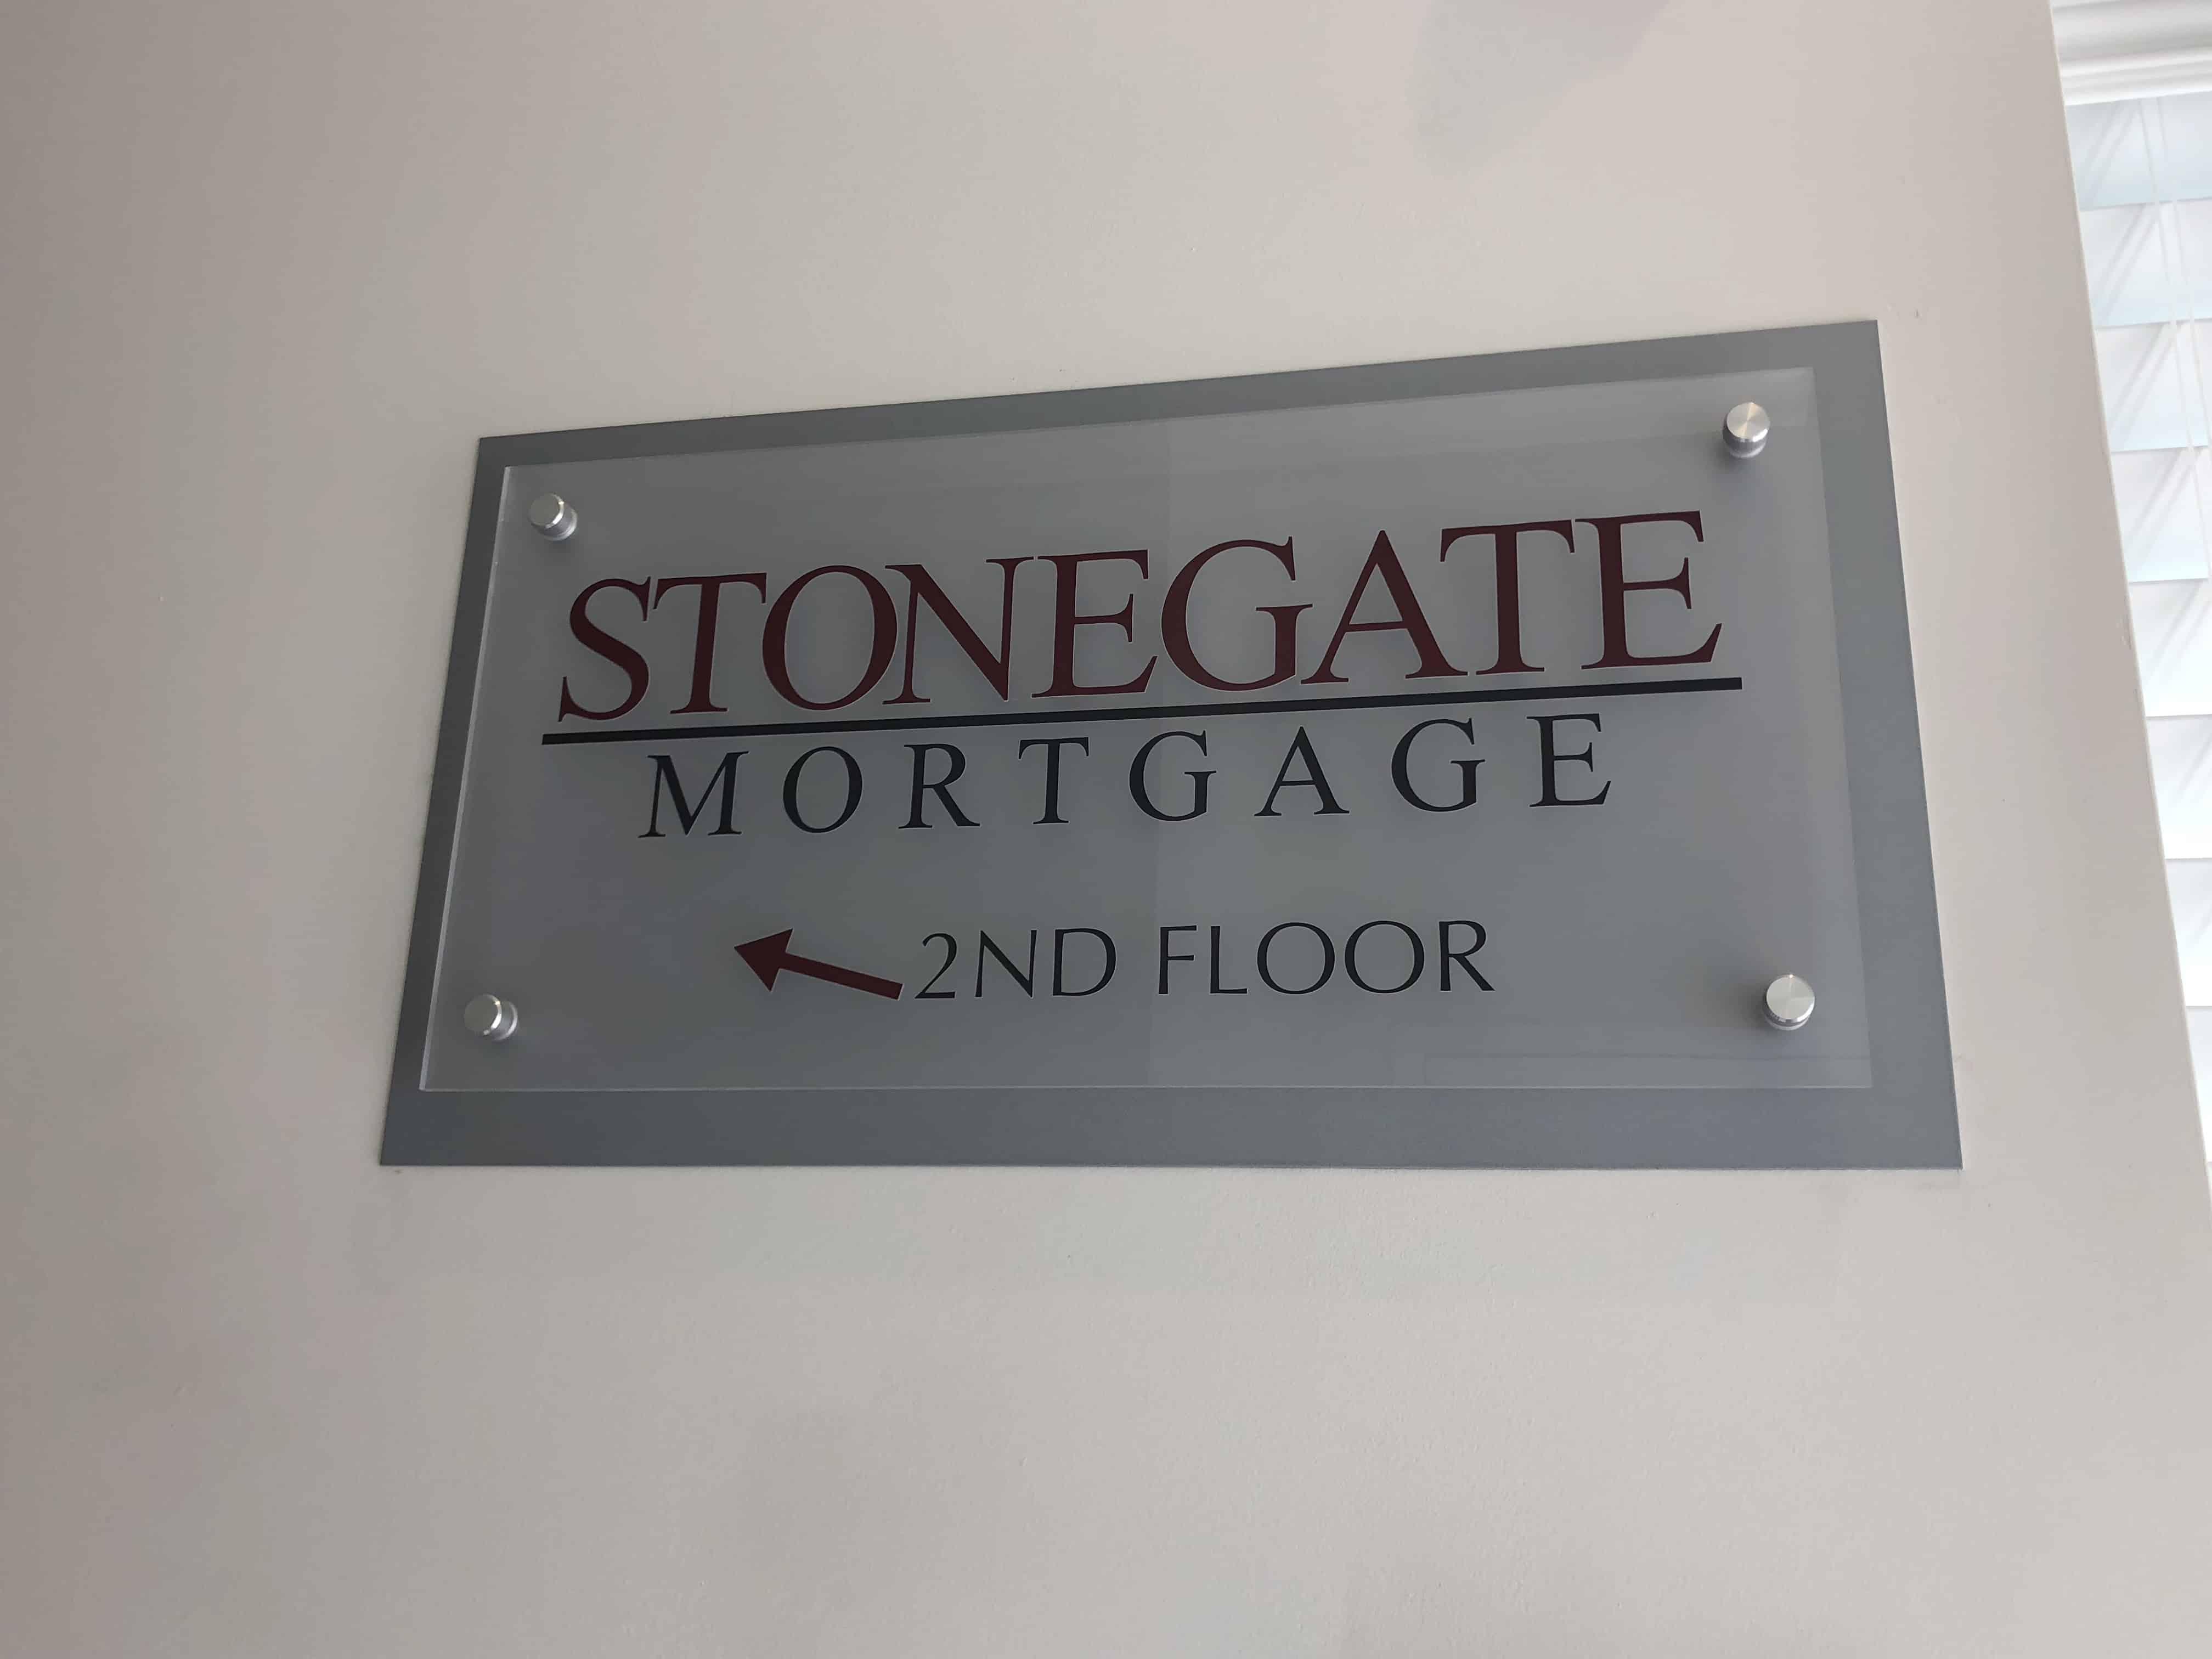 Stonegate Plaque